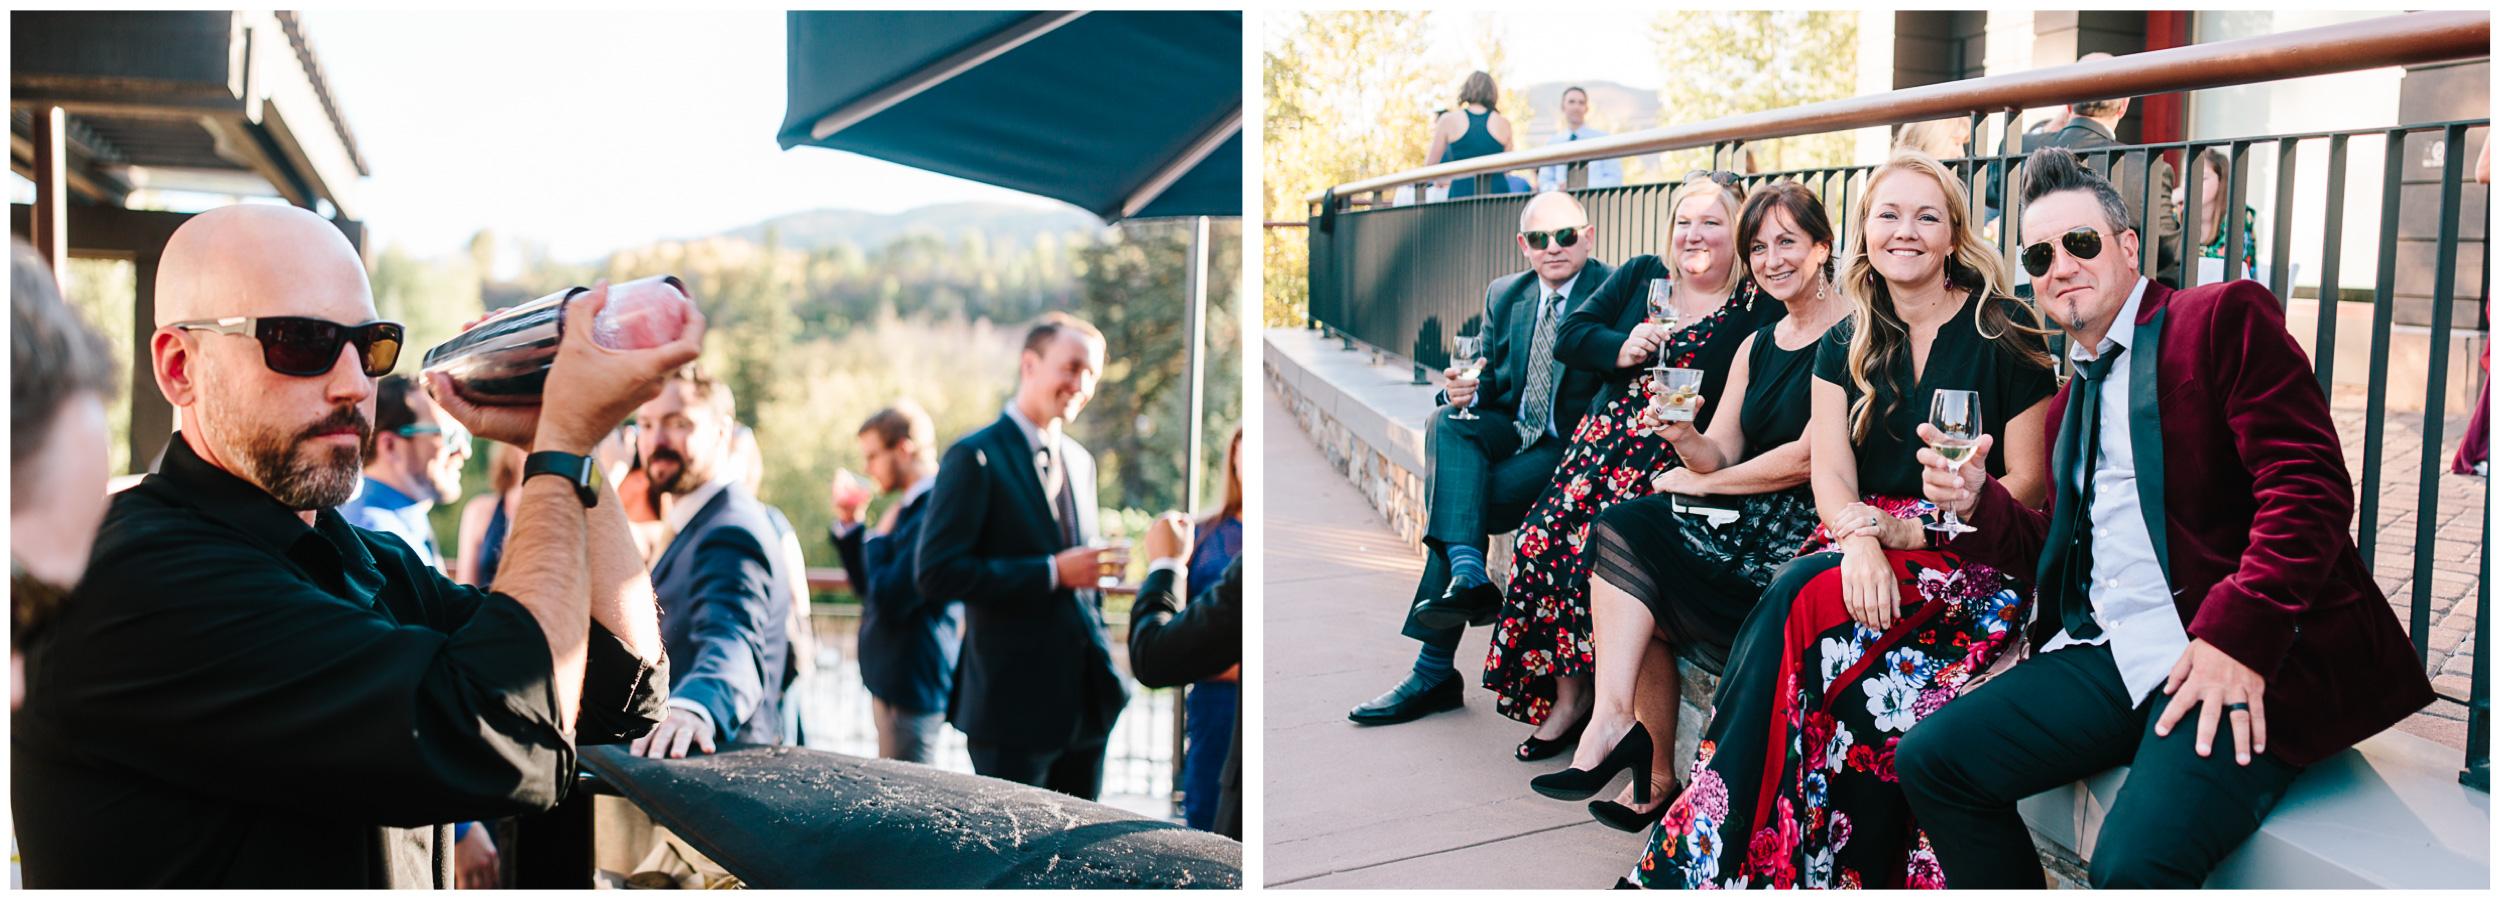 westin_riverfront_wedding_57.jpg